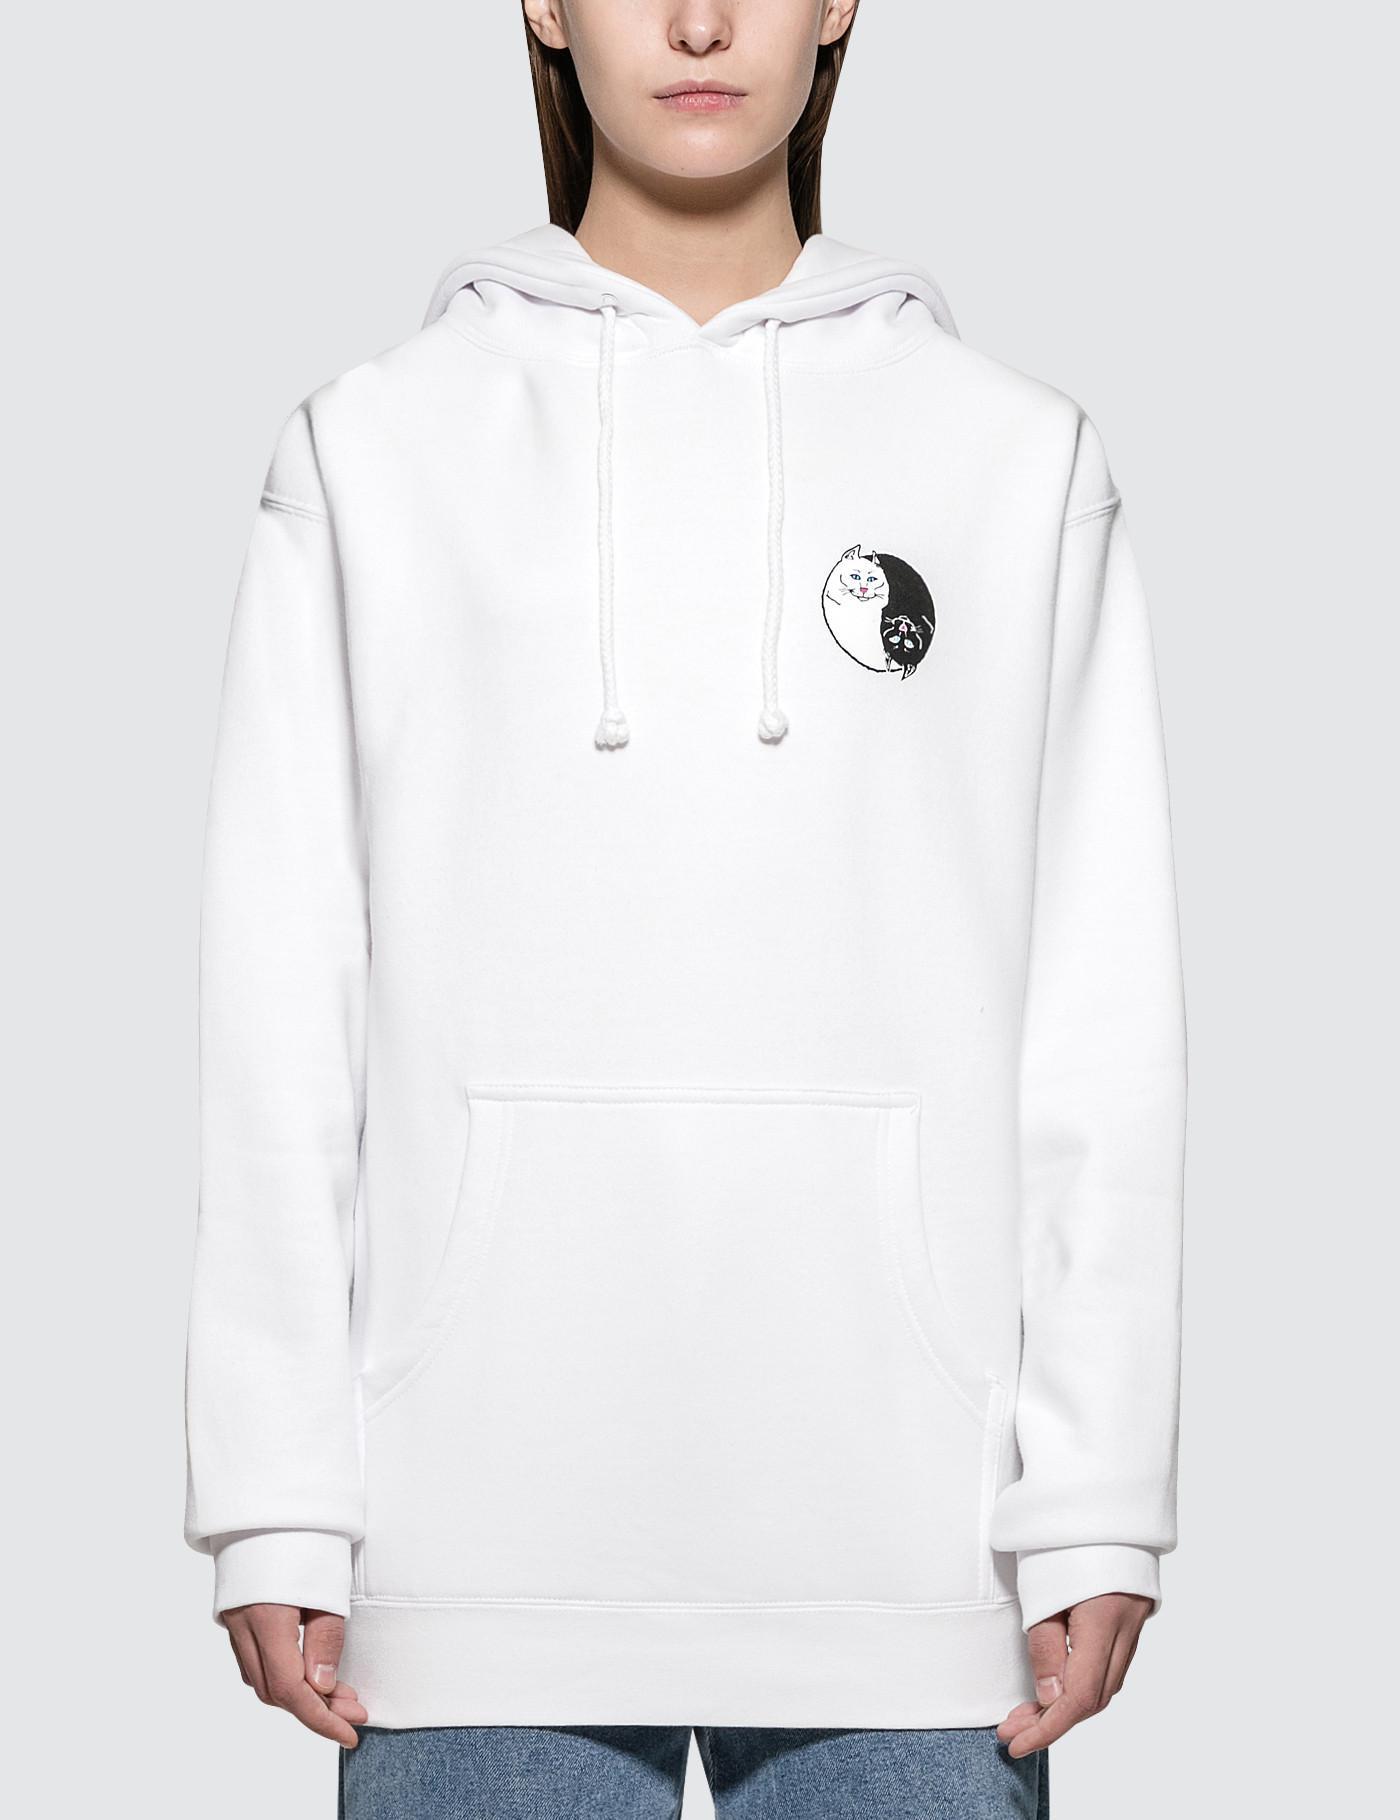 b7ef47ab0b1b2 RIPNDIP Nermal Yang Pullover Sweater in White - Lyst